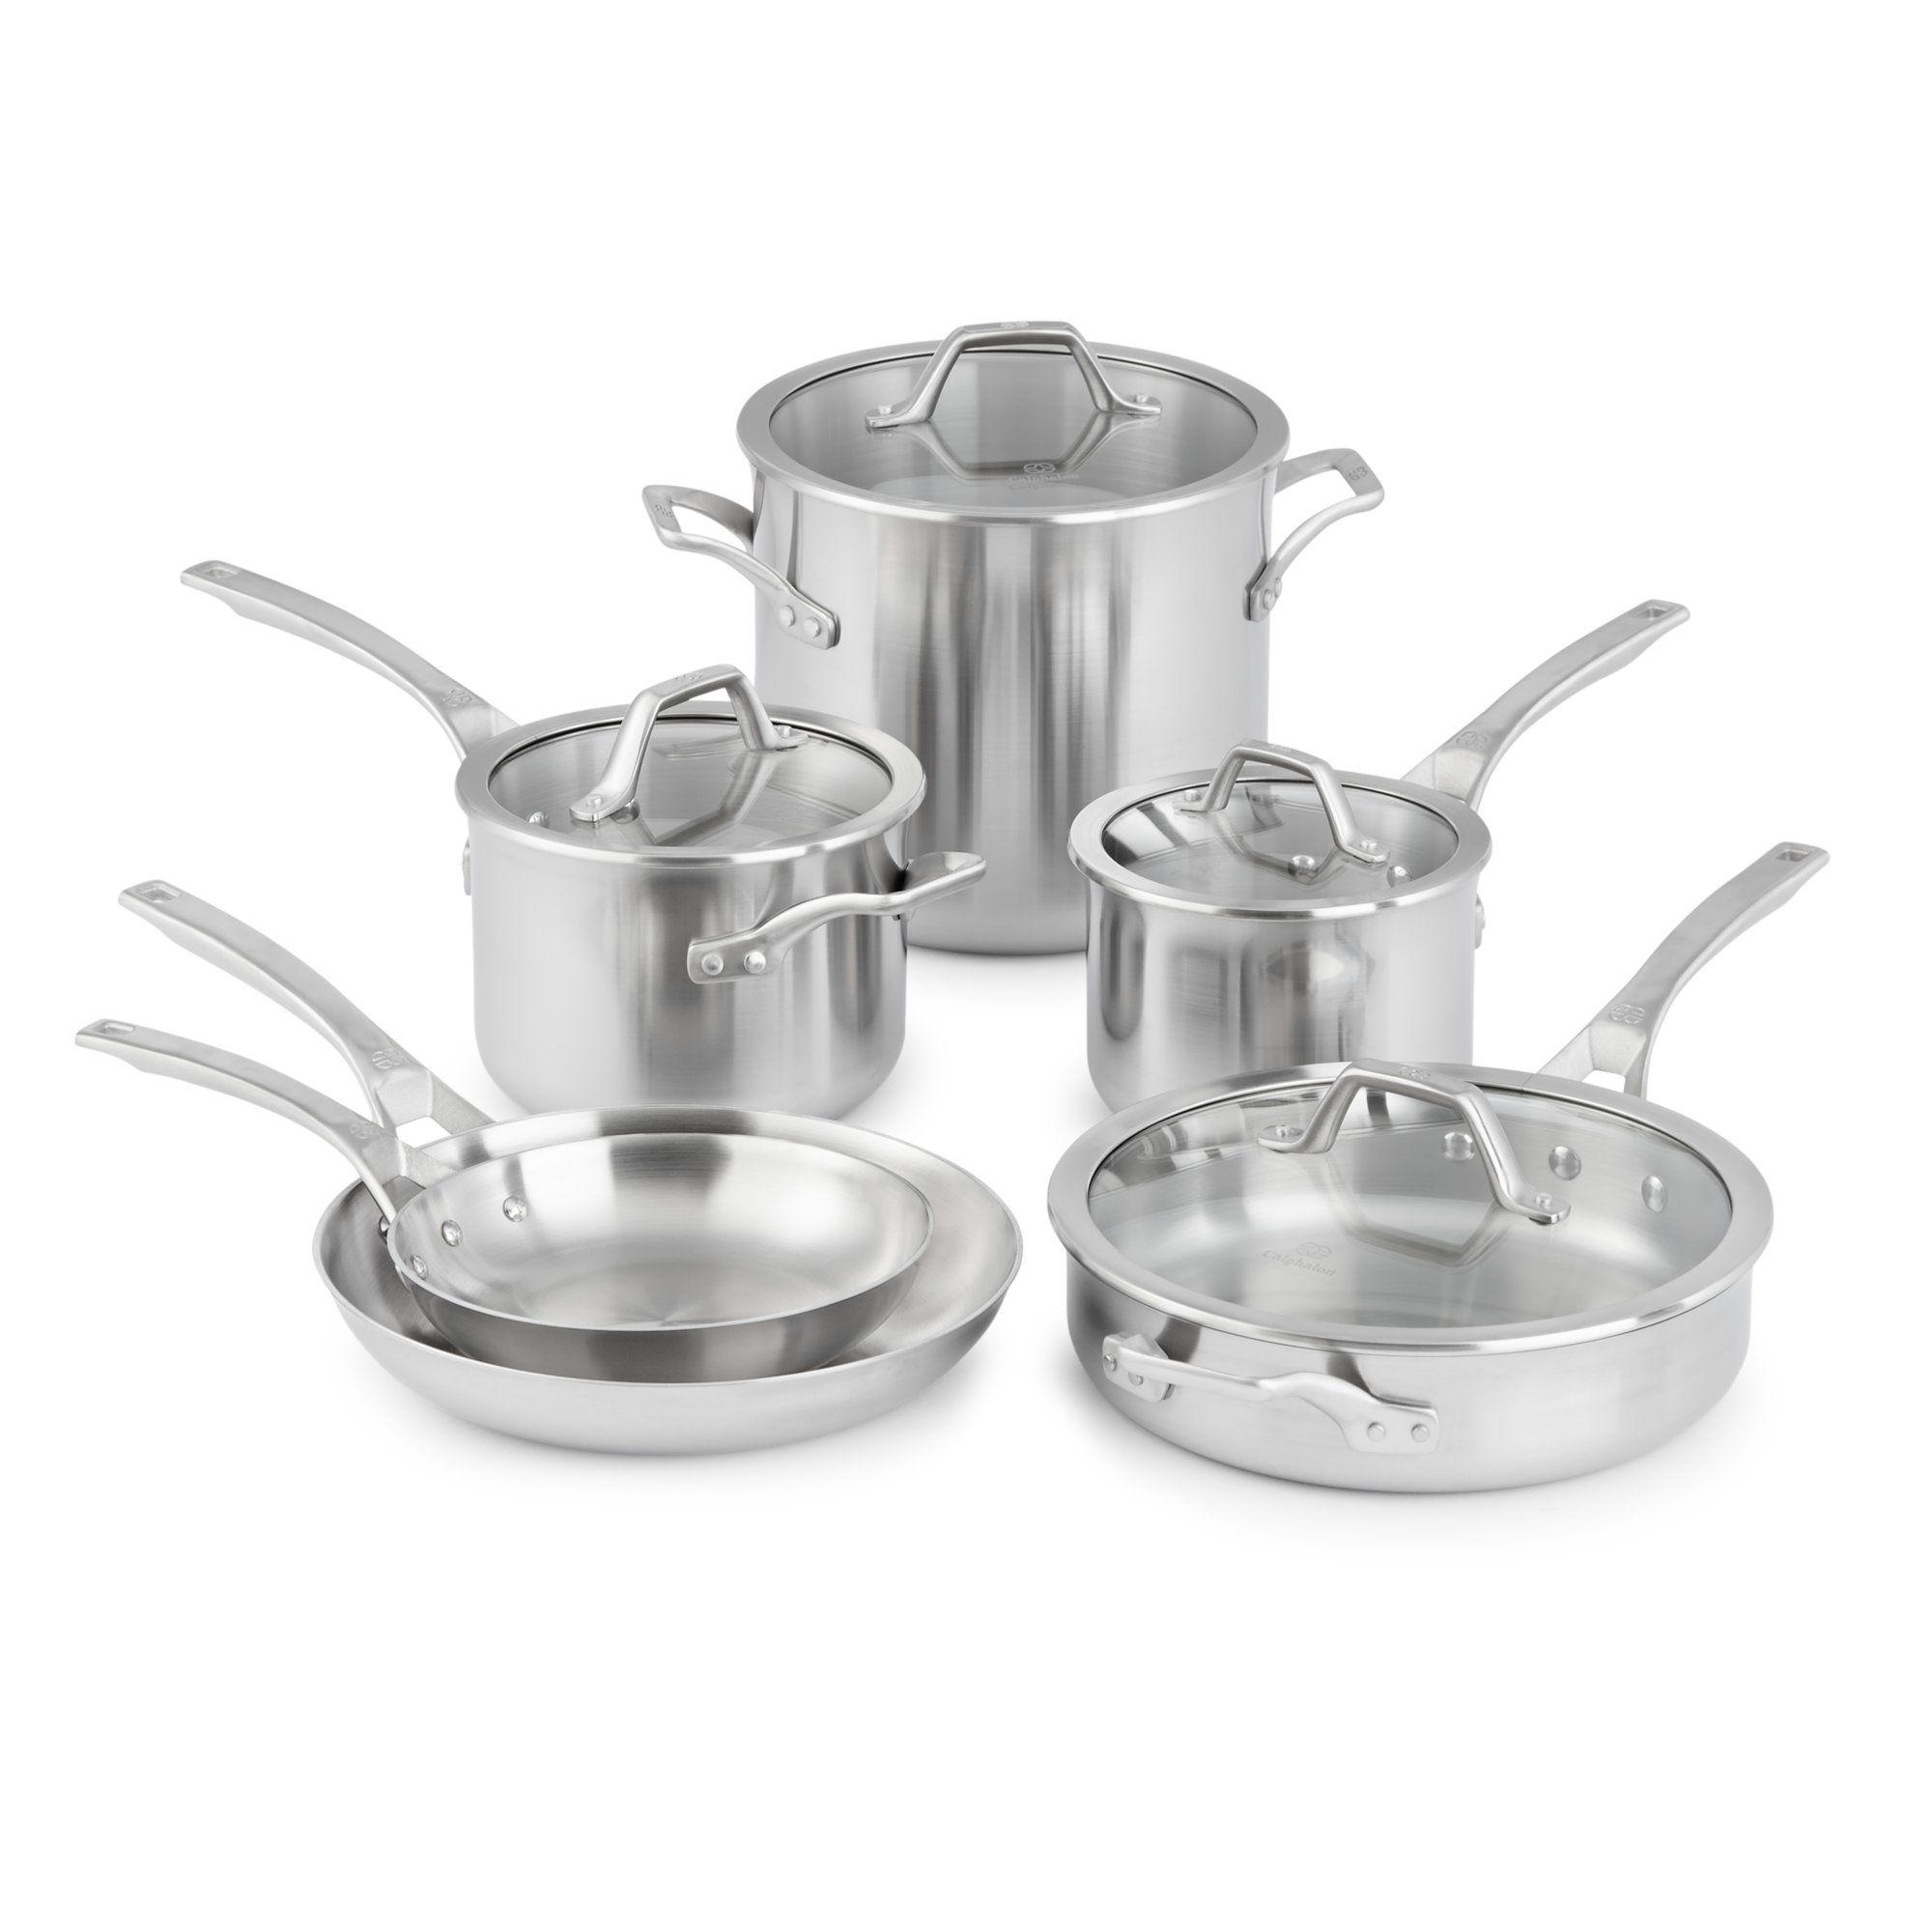 Calphalon signature stainless steel 10pc cookware set